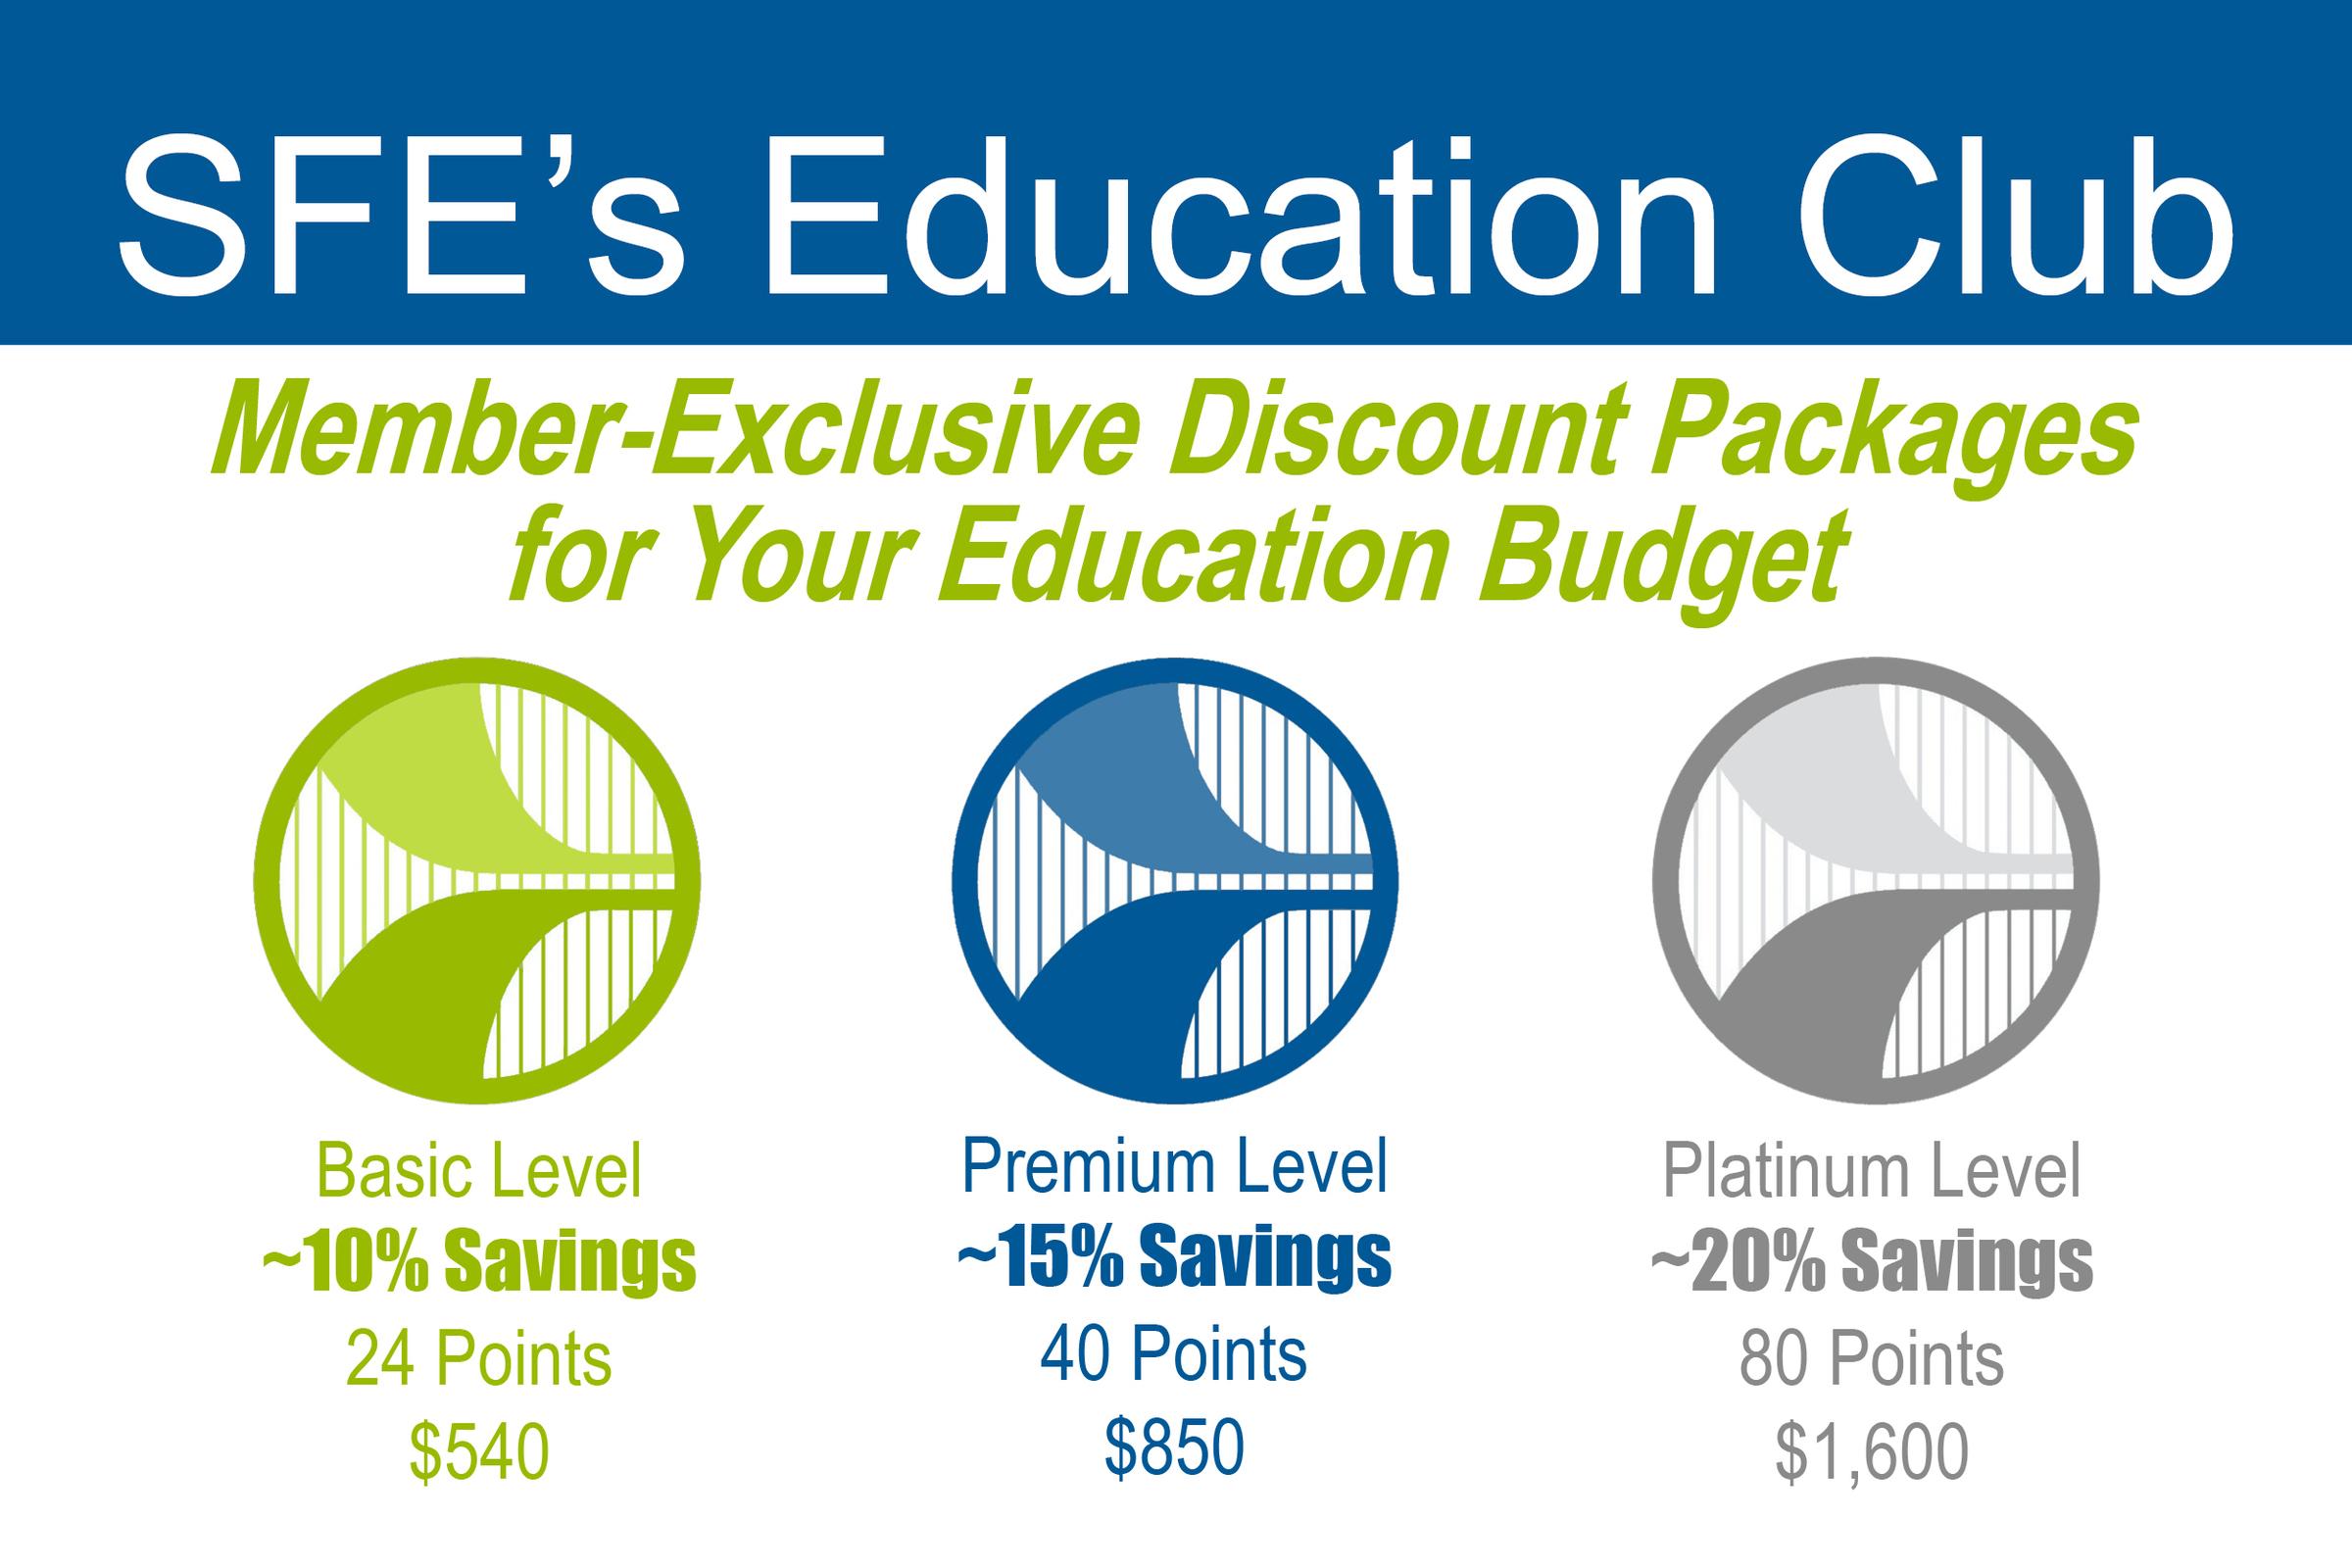 SFE Education Club